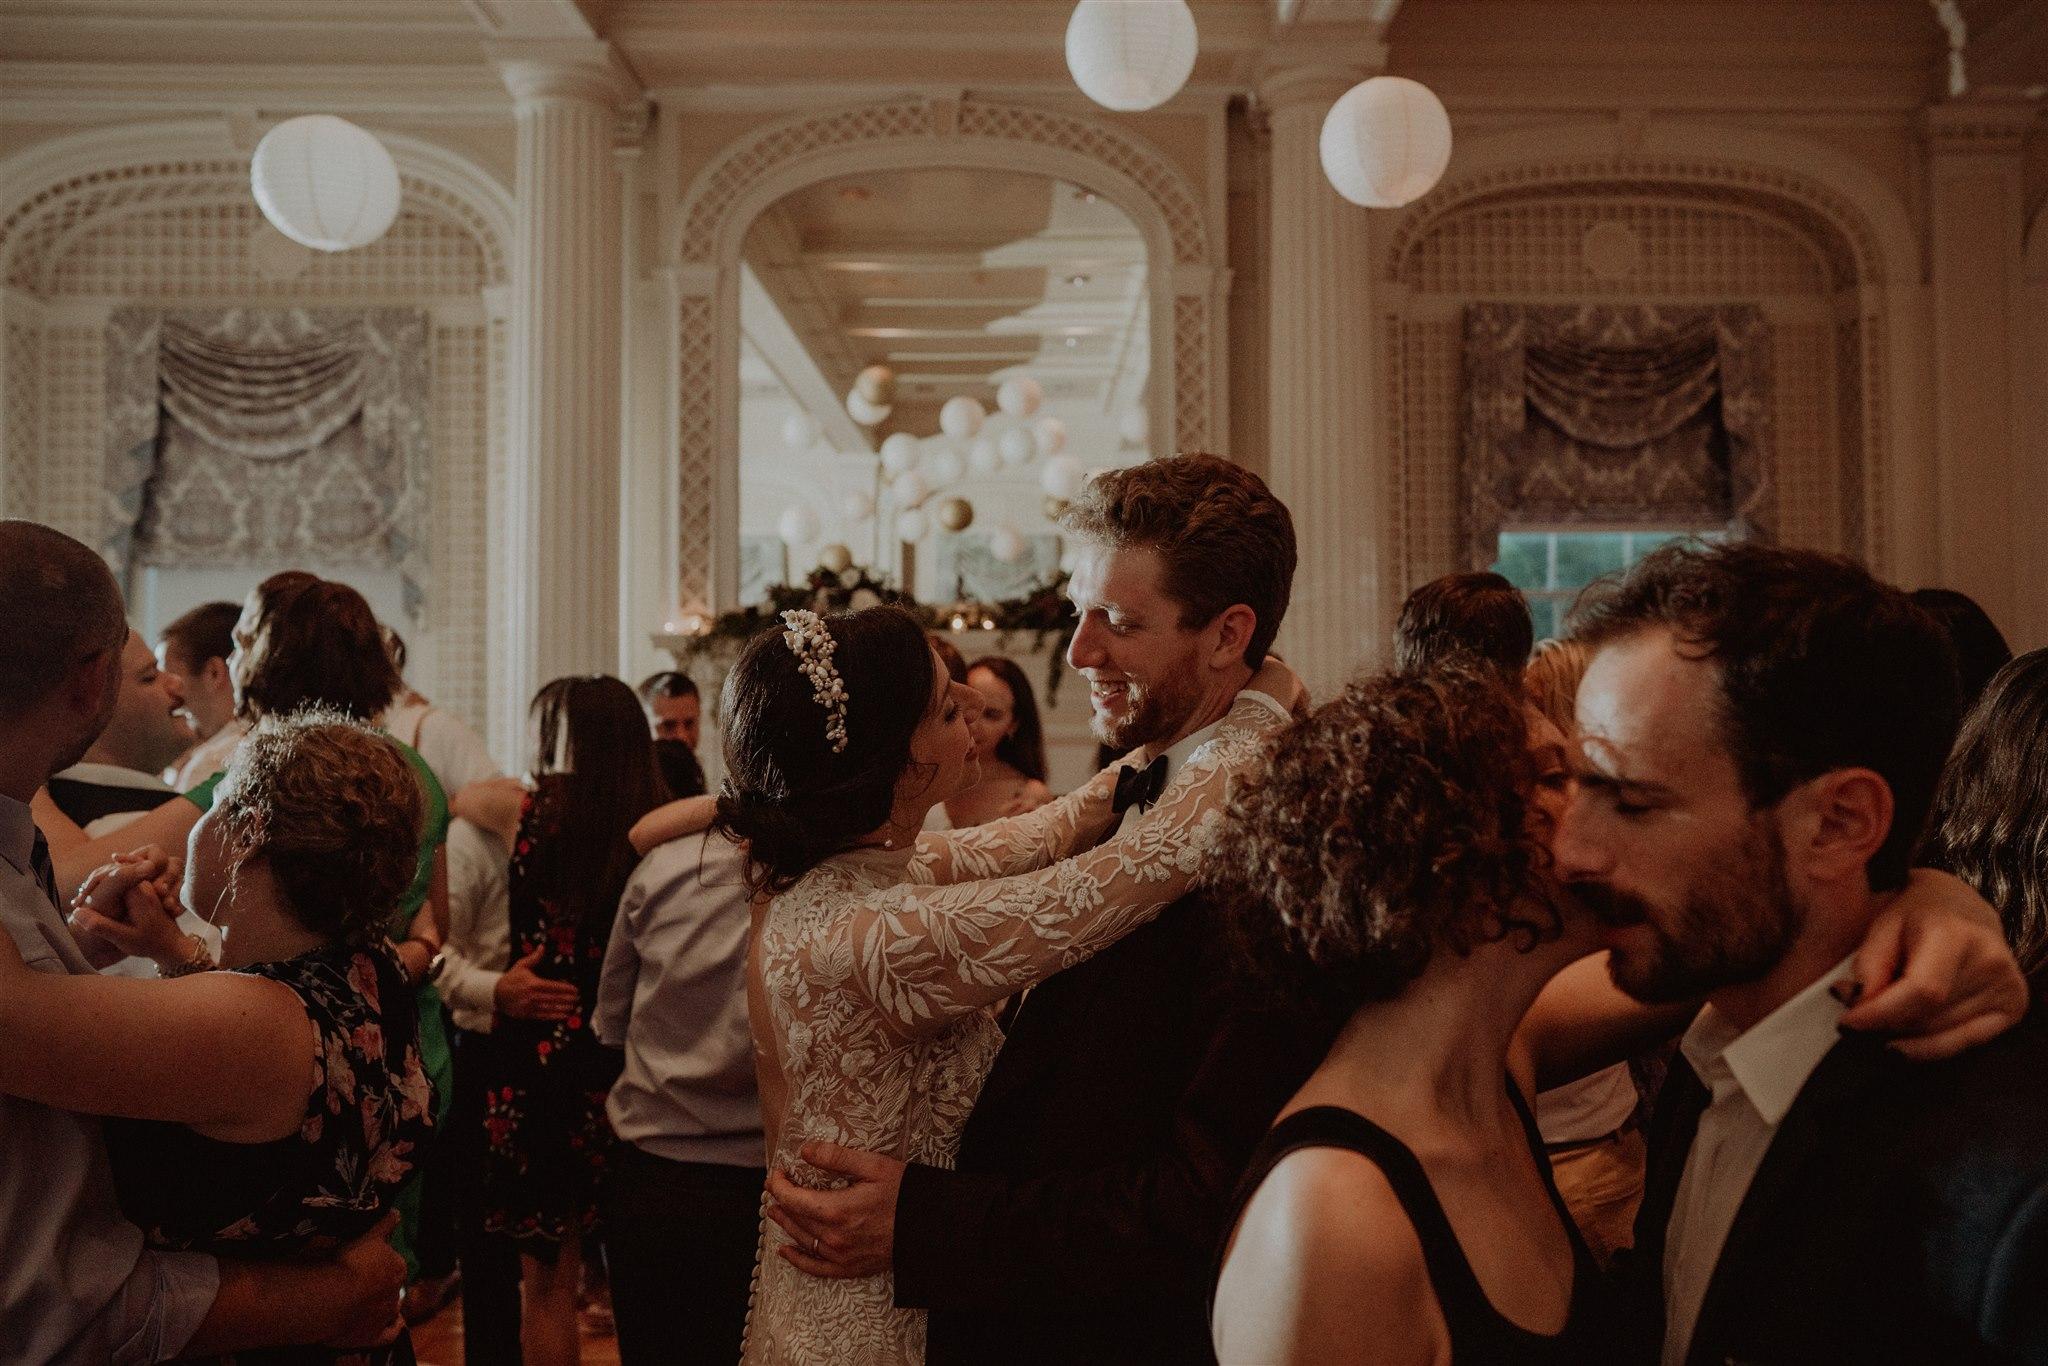 Chellise_Michael_Photography_Hudson_Valley_Wedding_Photographer_Otesaga_Hotel-6188.jpg